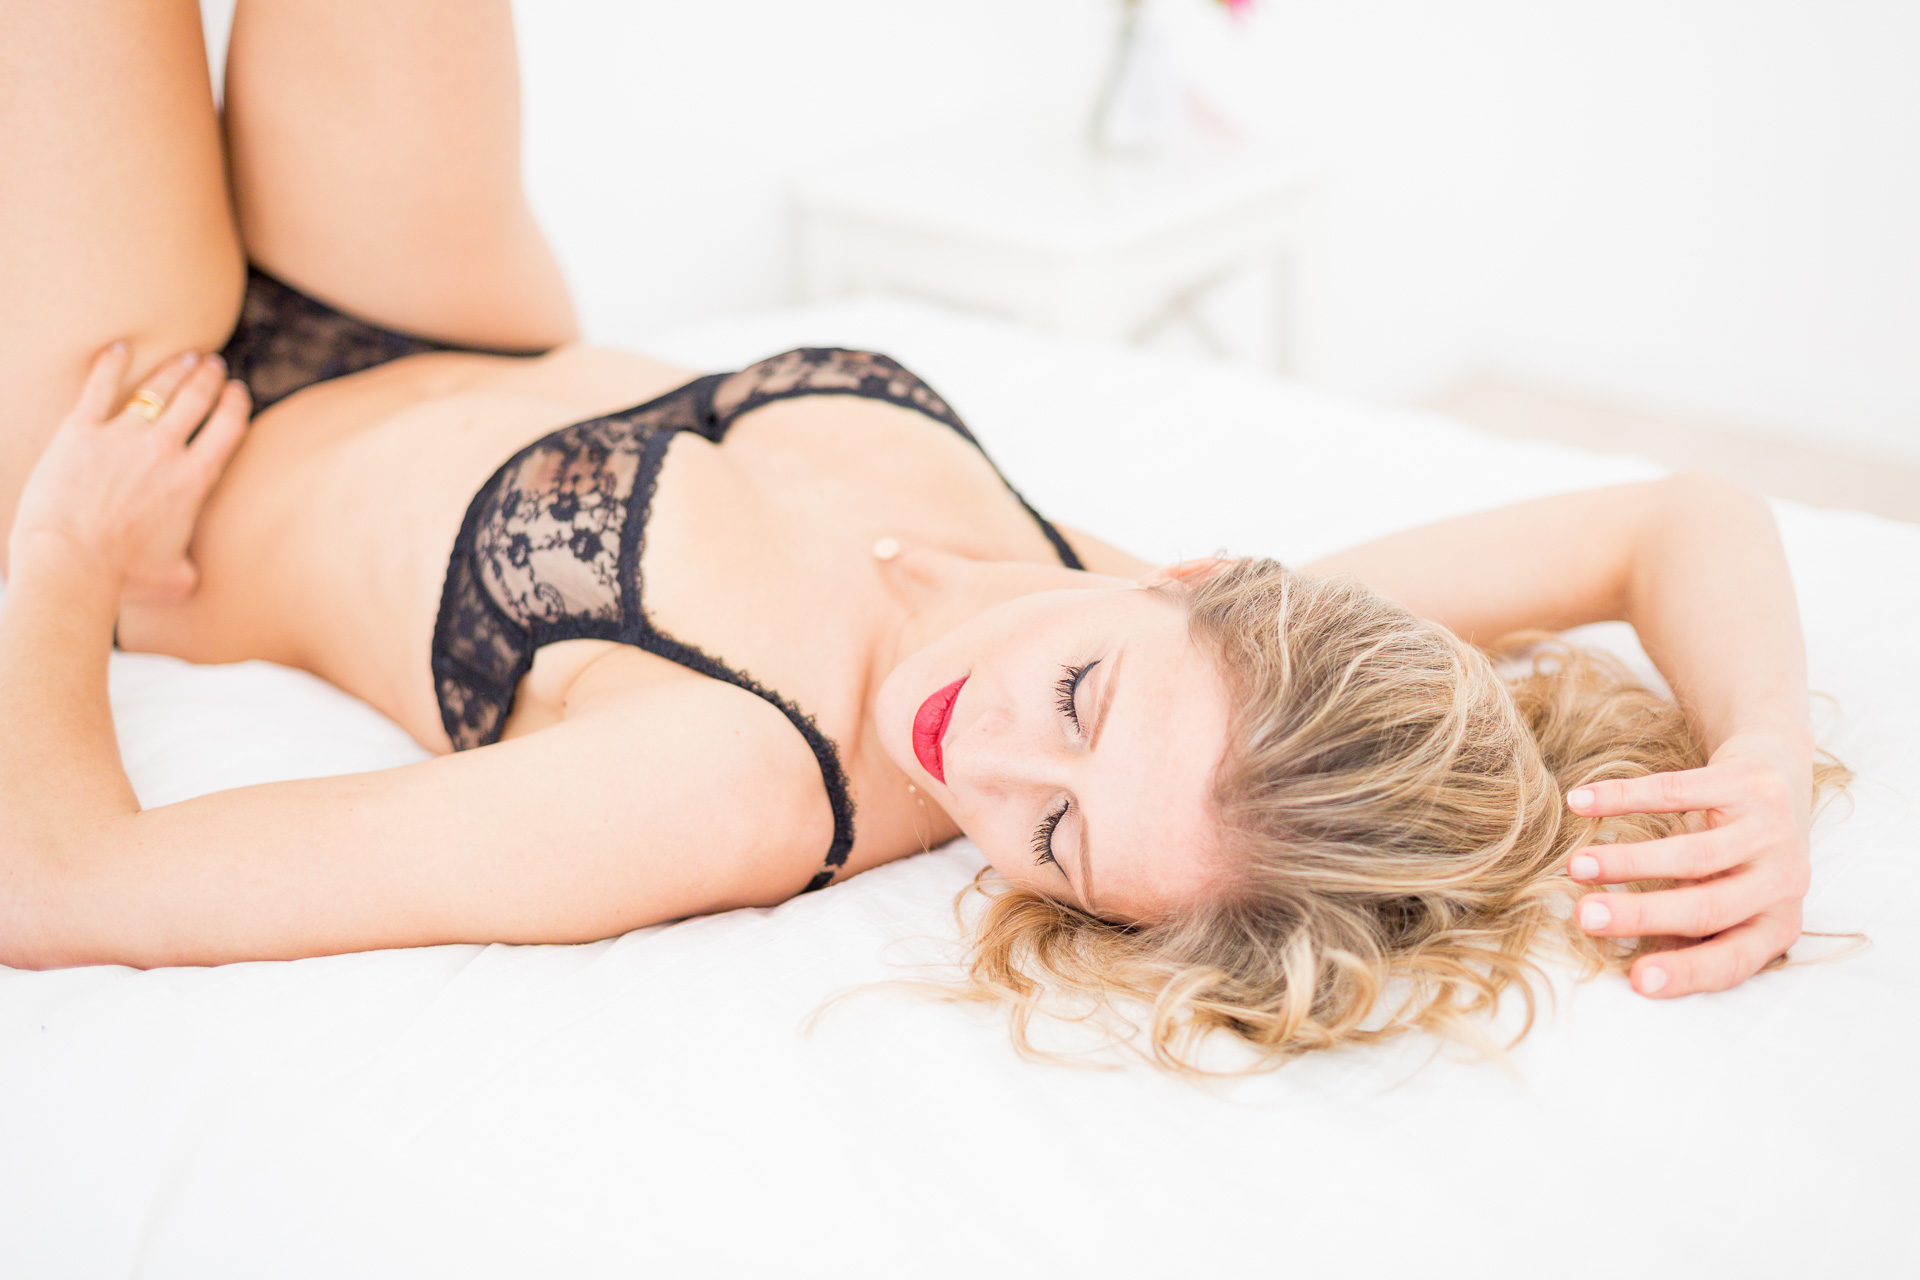 sensual photoshoot inspiration